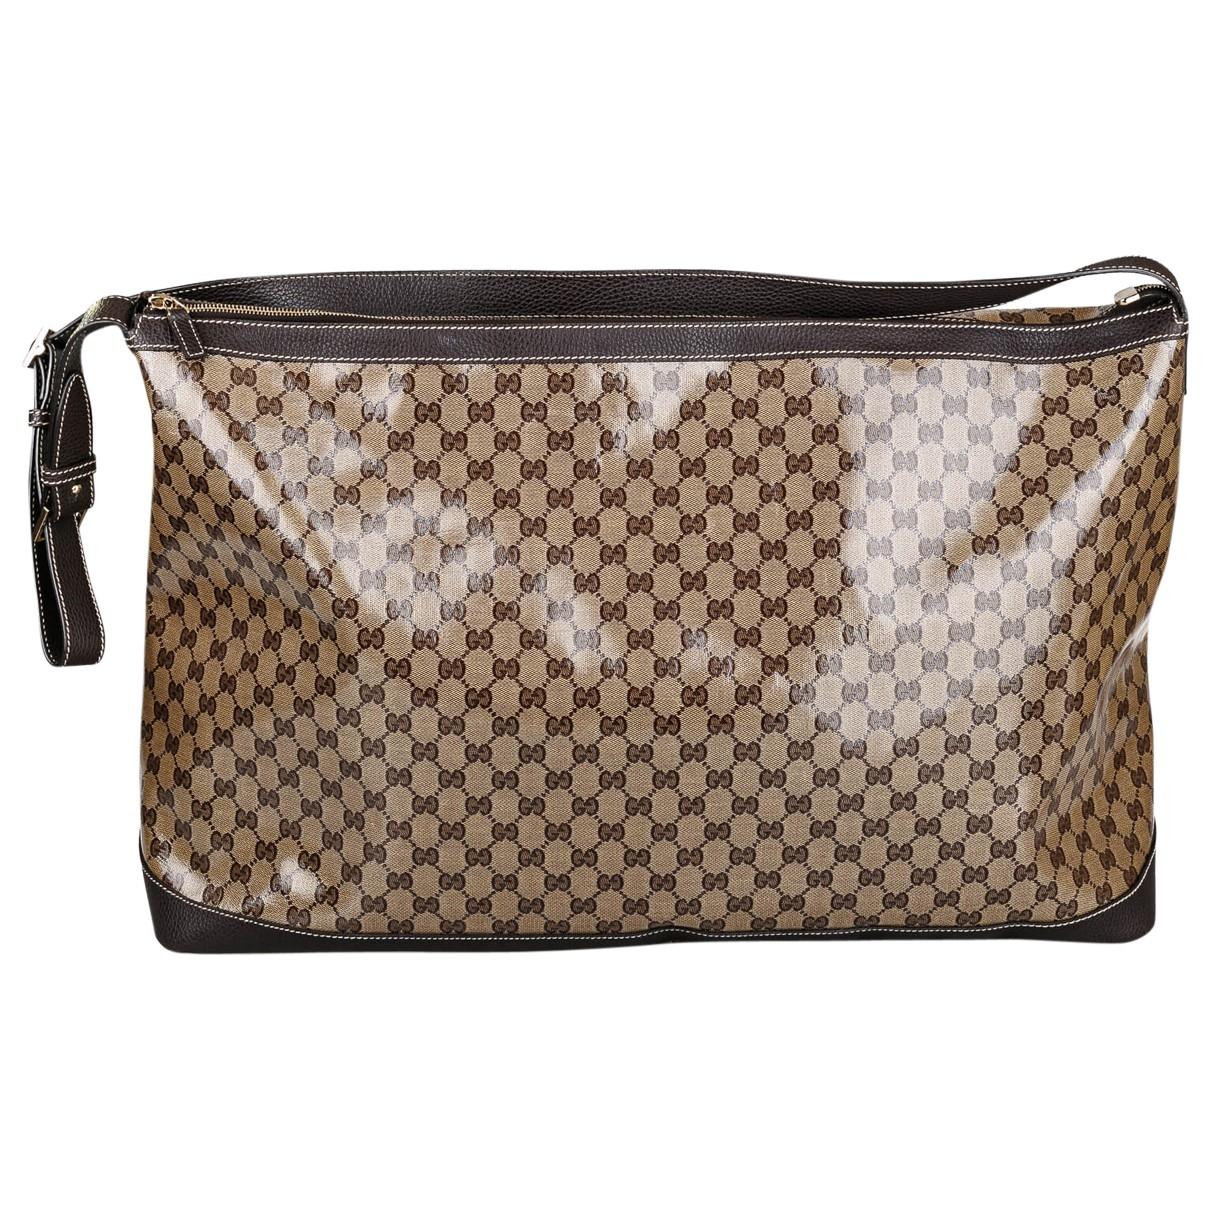 Gucci \N Travel bag for Women \N